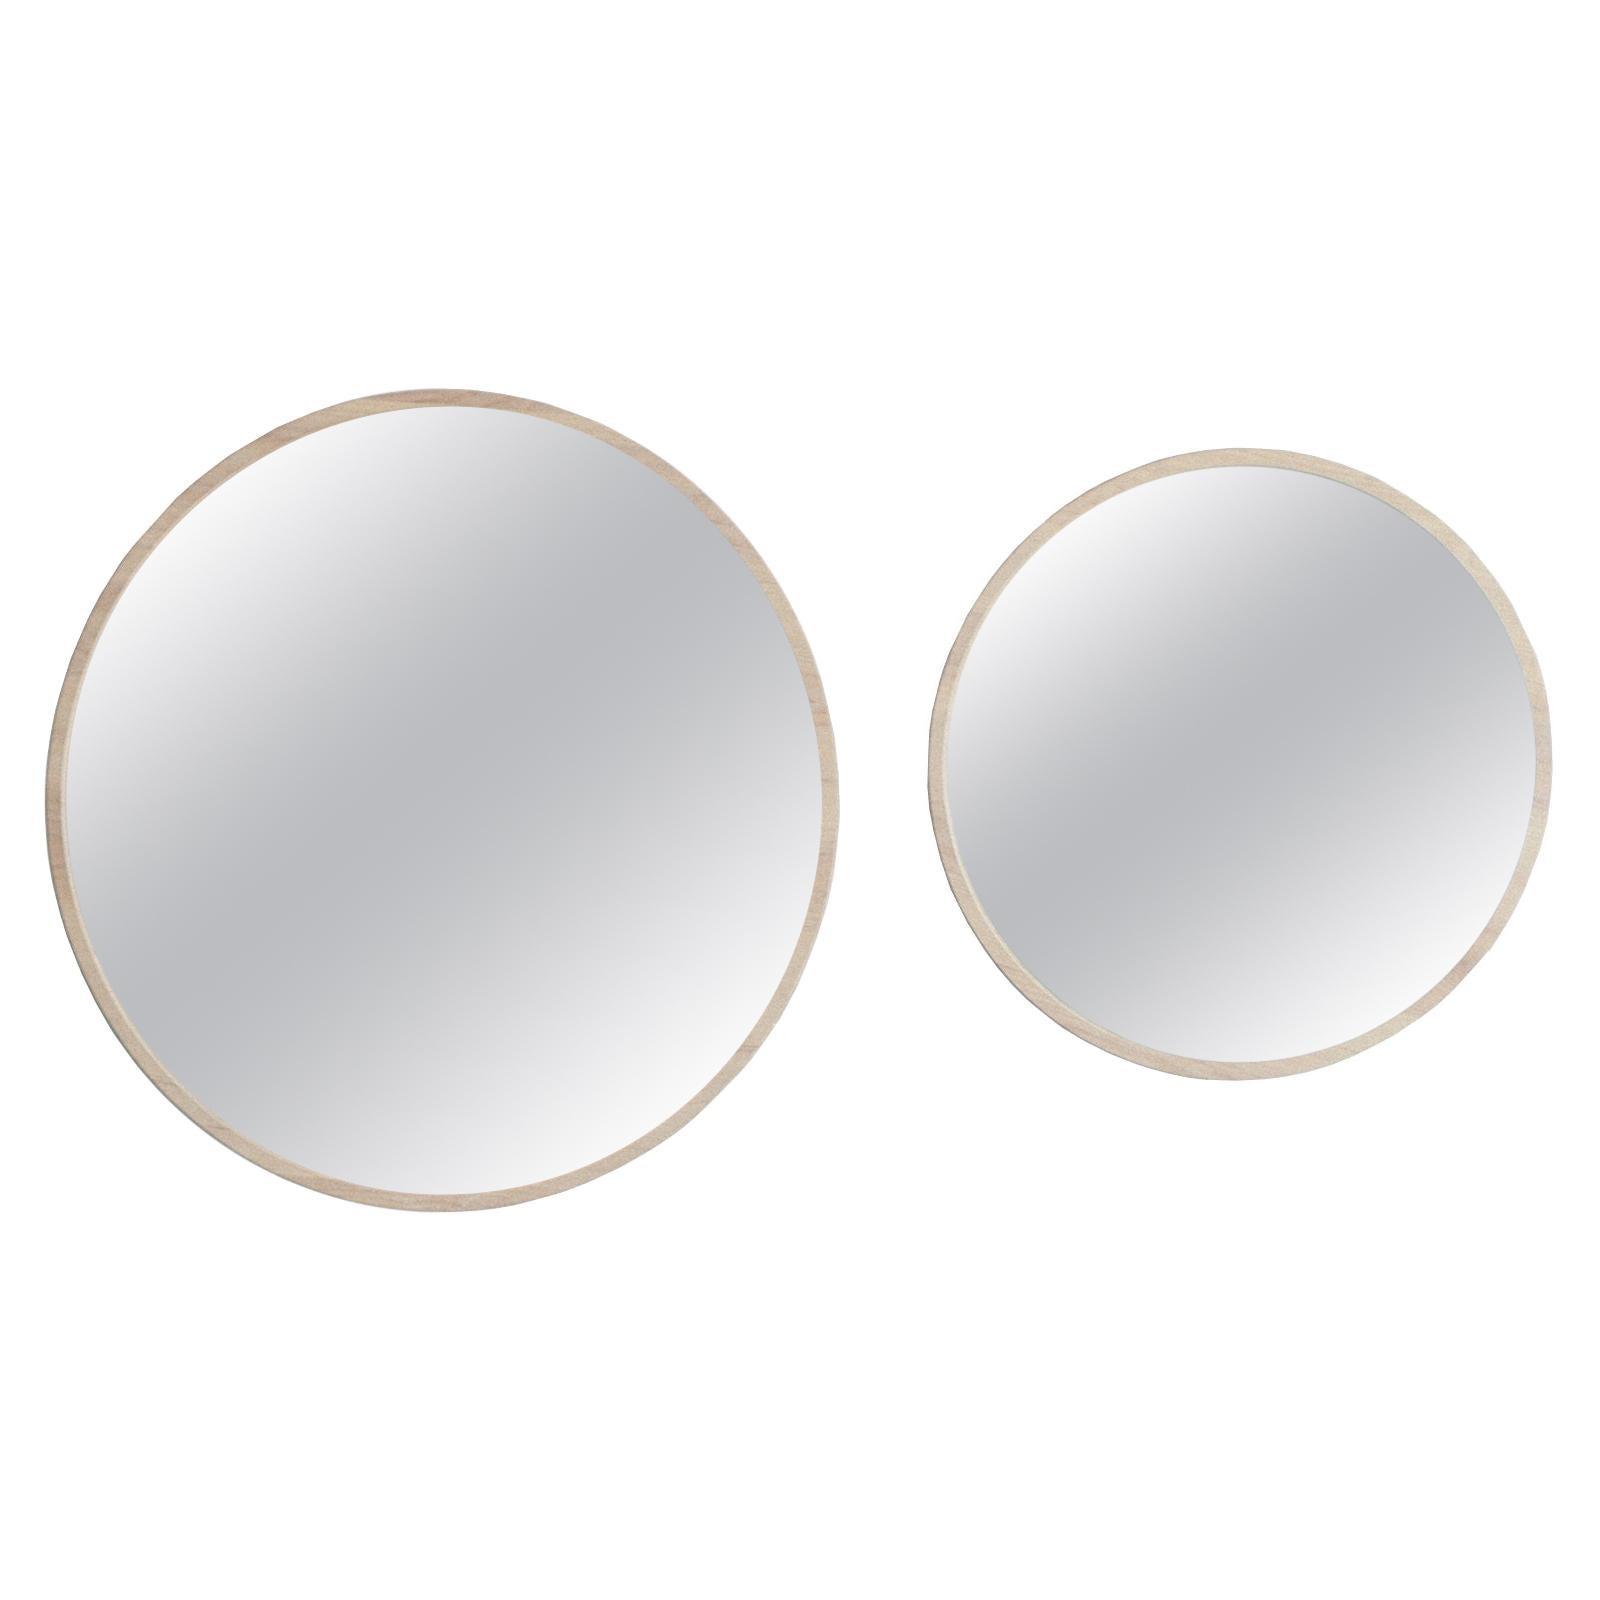 Amelie ash wood frame Mirrors set